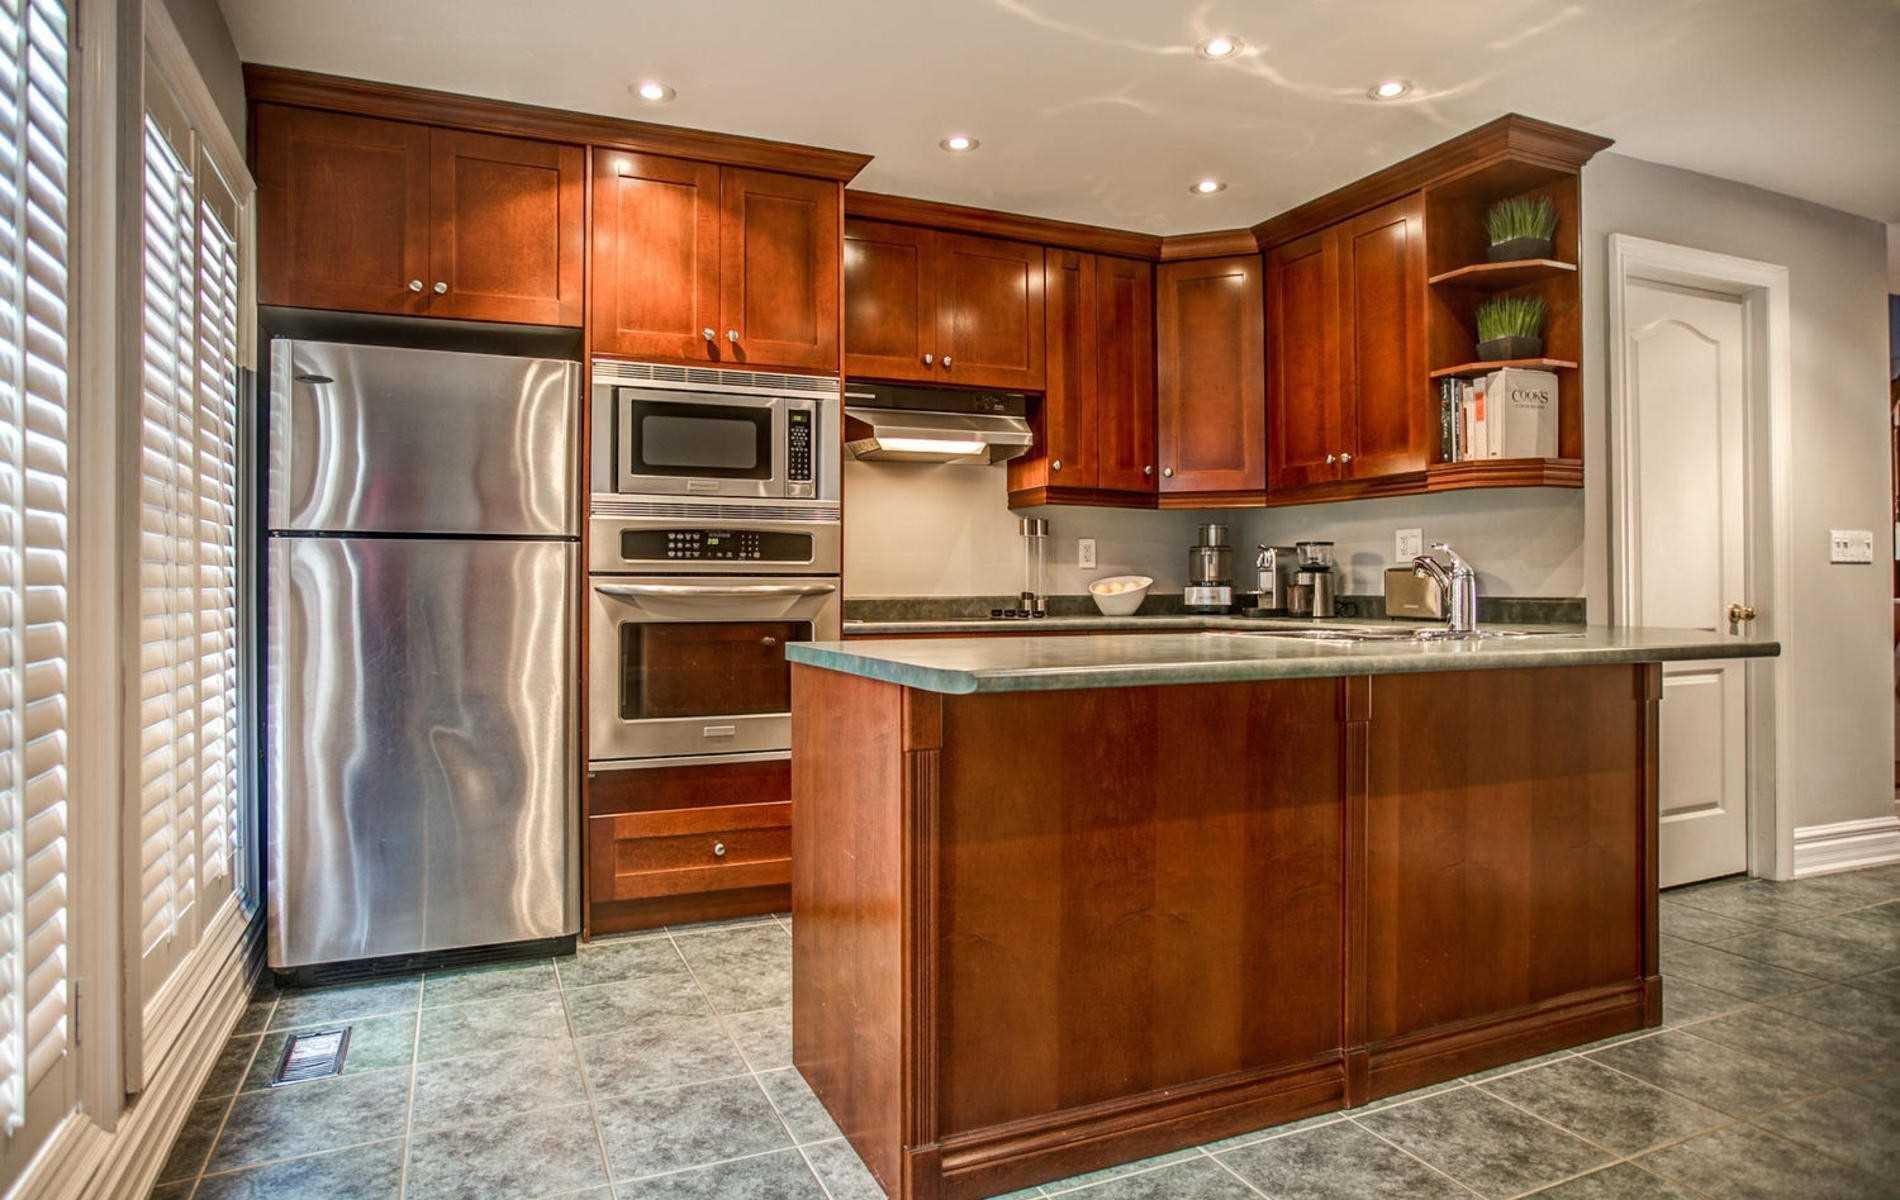 Photo 6: Photos: 119 Carlaw Avenue in Toronto: South Riverdale House (3-Storey) for lease (Toronto E01)  : MLS®# E4386176